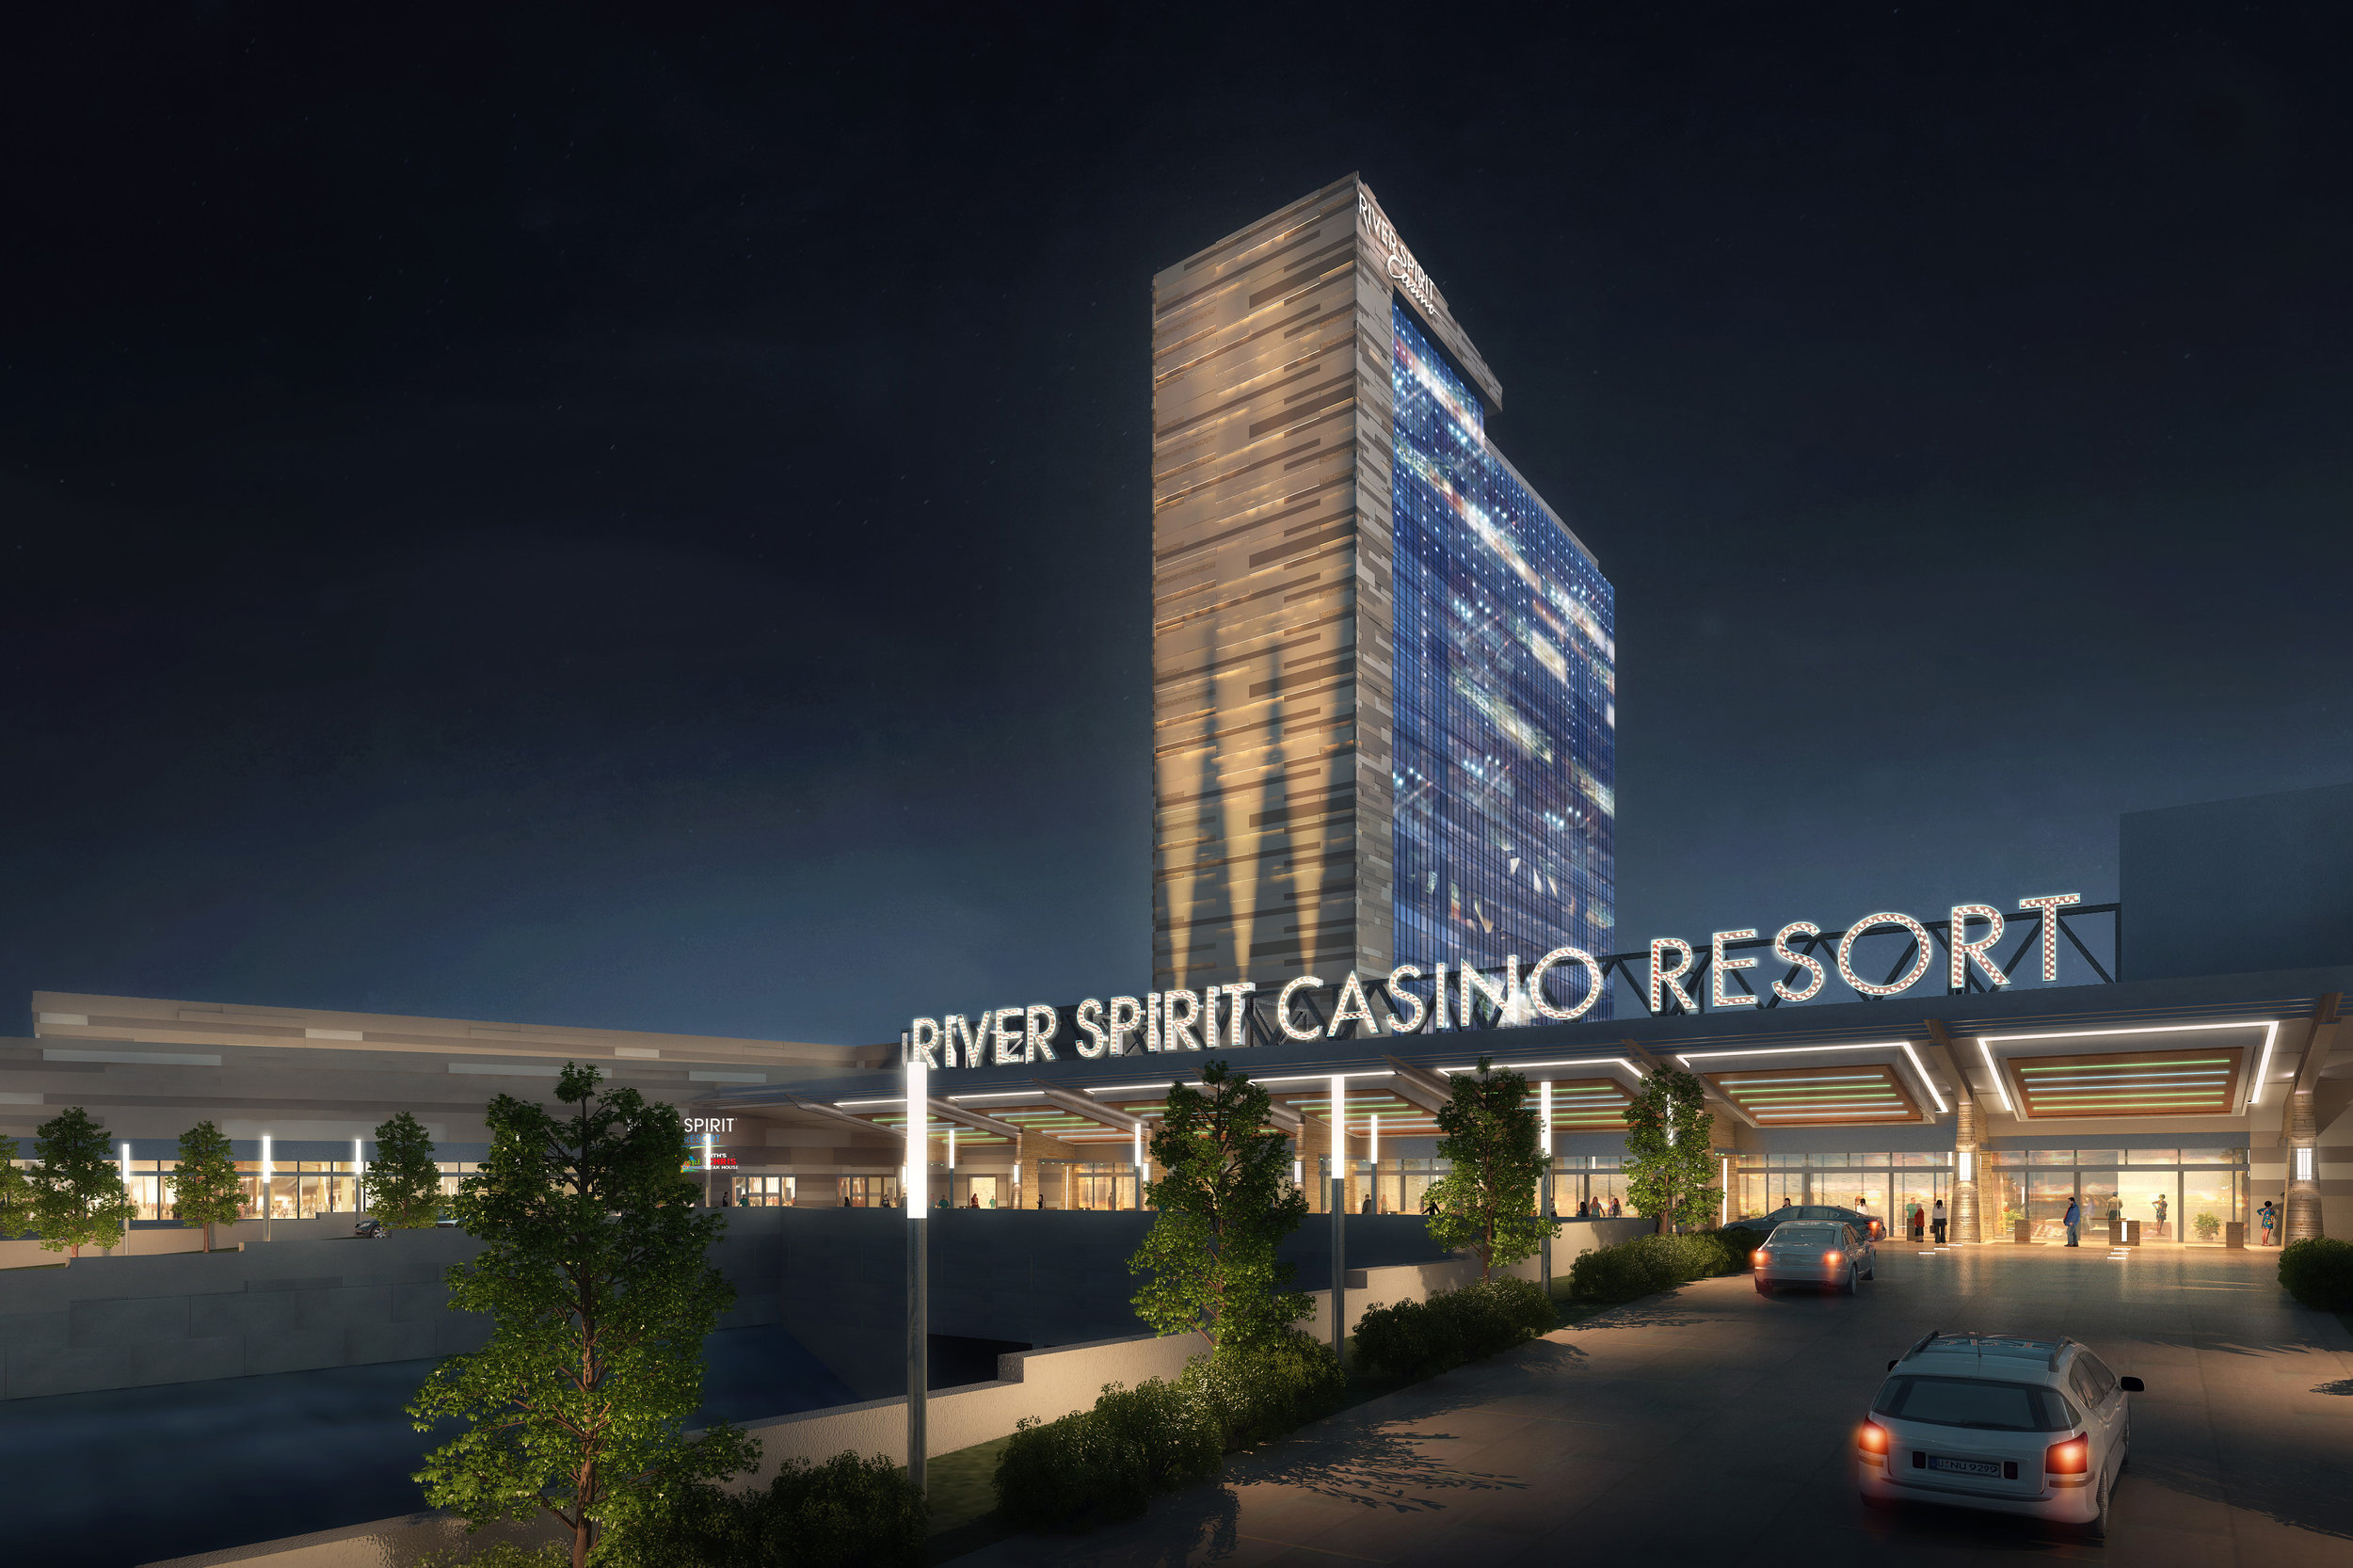 Tulsa, OK | 29-Story Hotel - 375,000 SF, Casino - 90,000 SF, Conference - 60,000 SF, Theater - 60,000 SF, Lobby - 60,000 SF = 1.2 Million SF Total | 2017